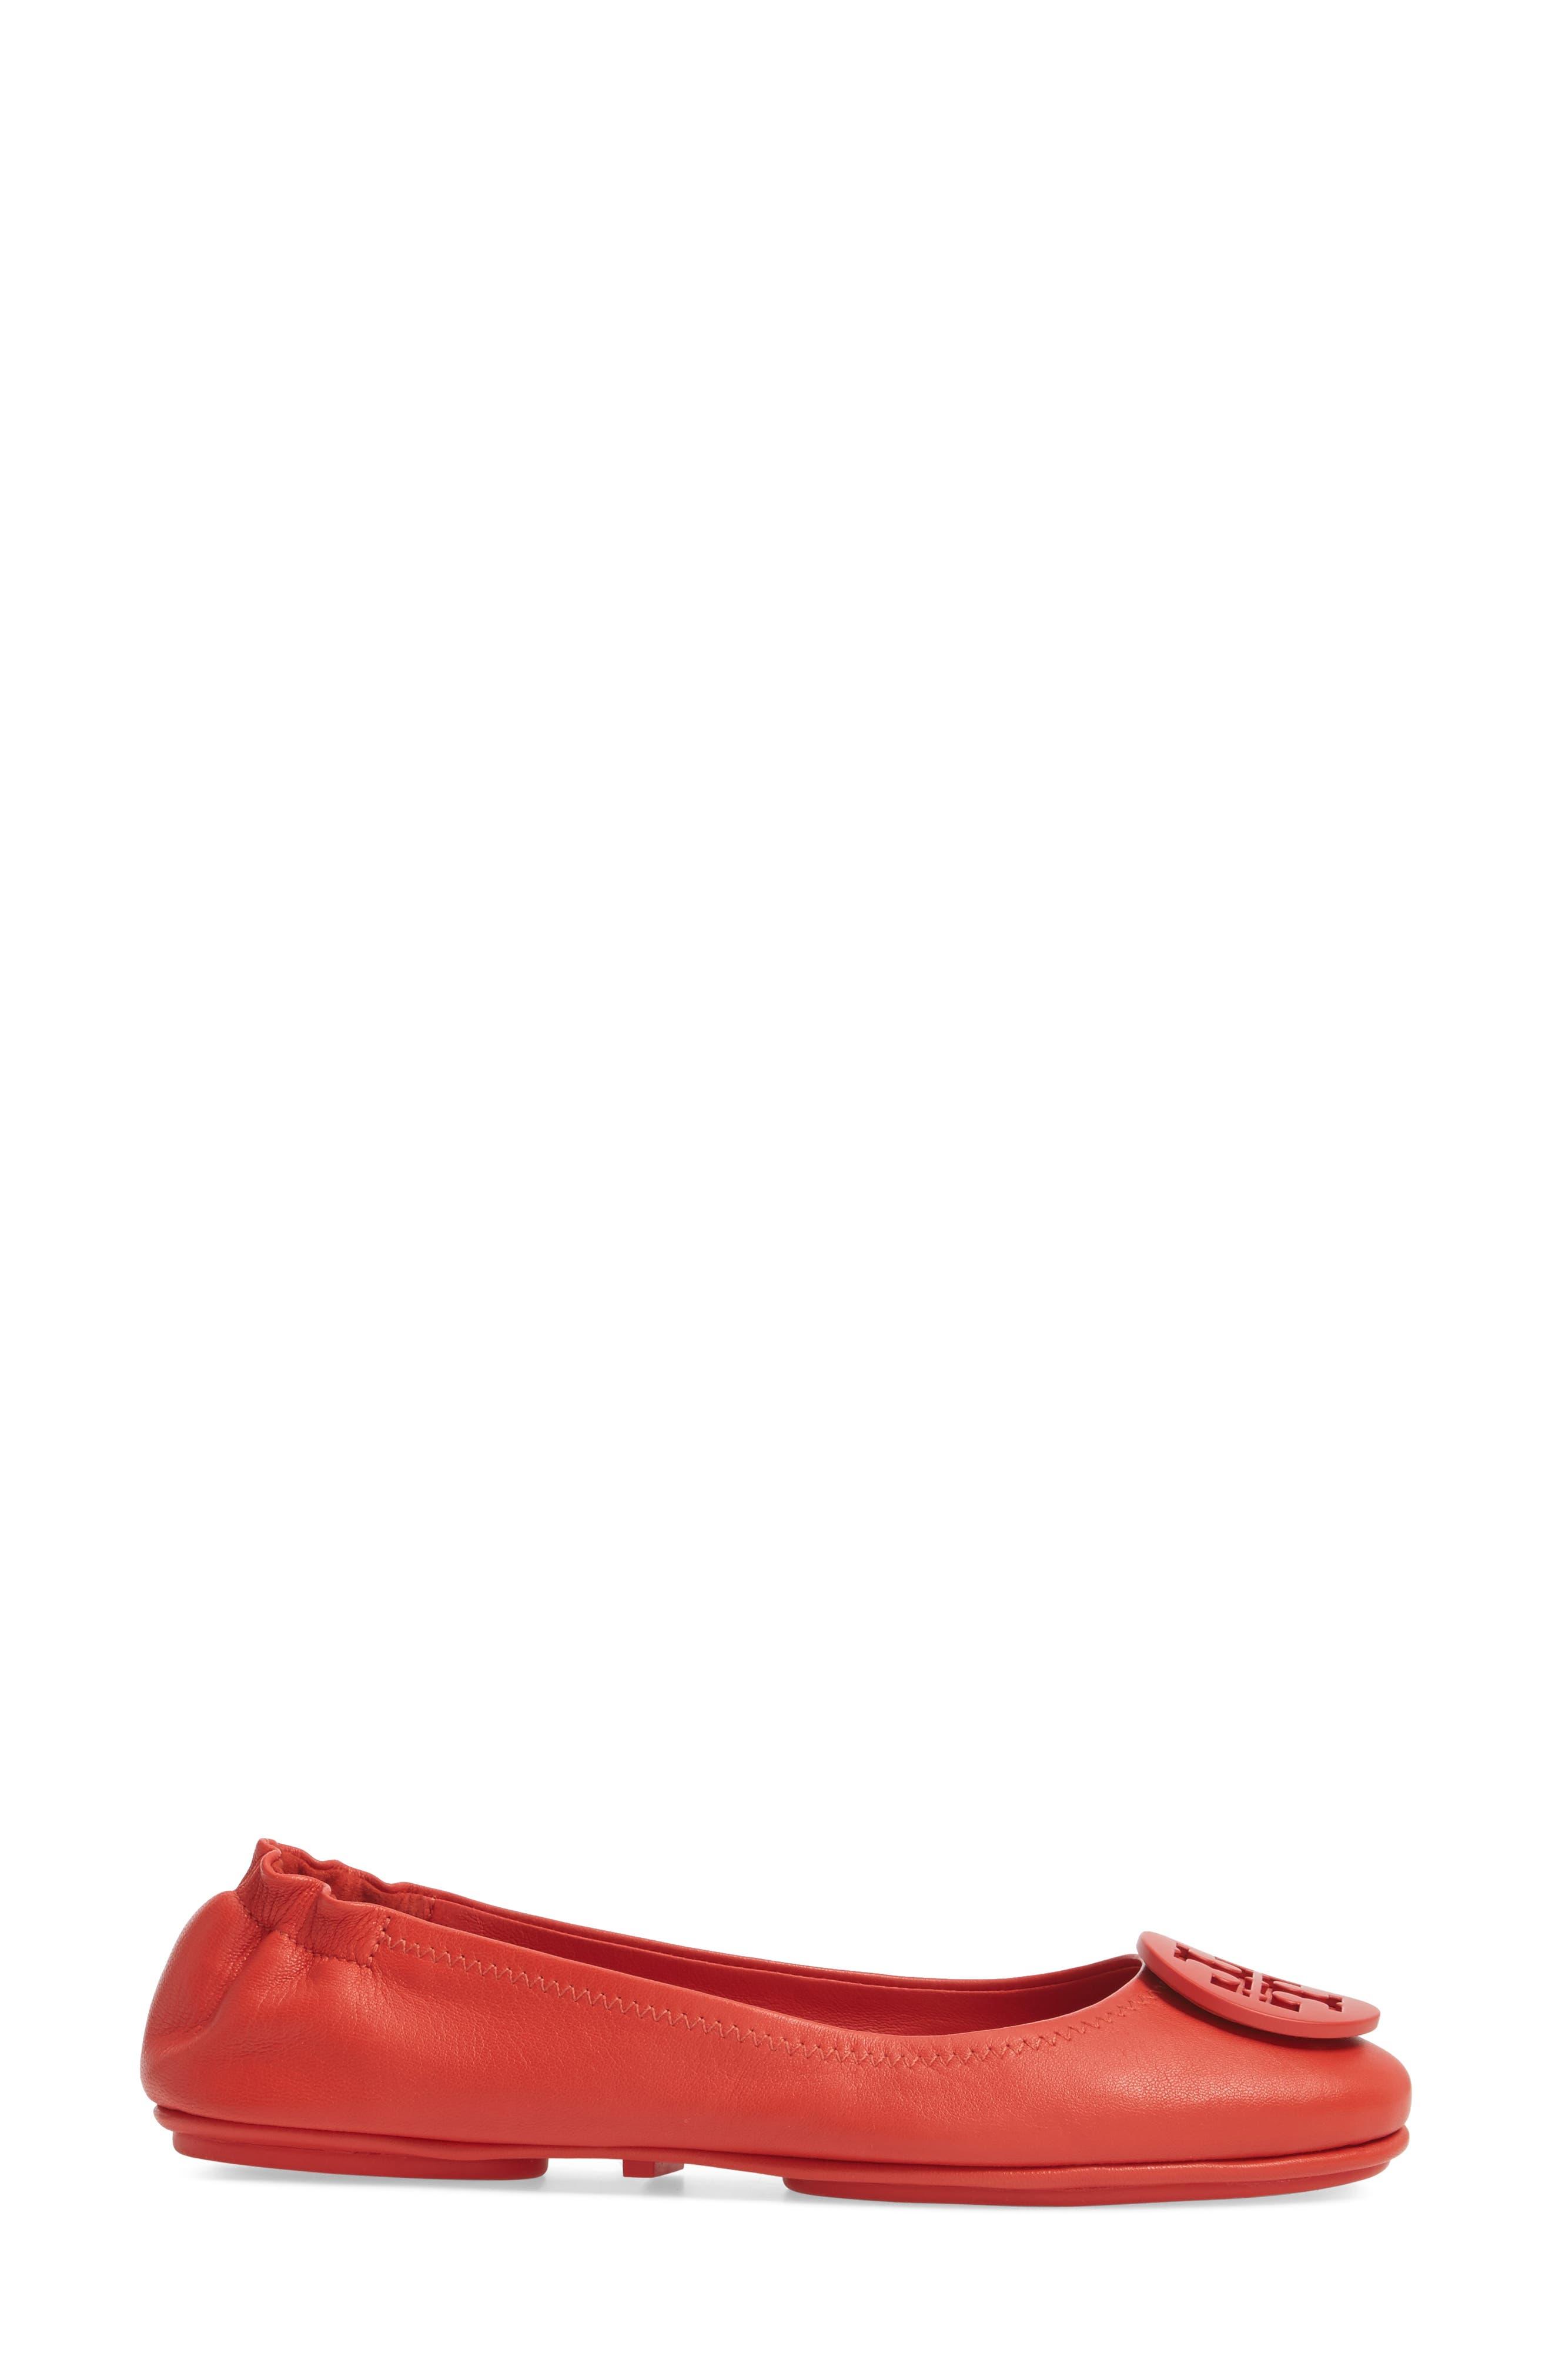 Alternate Image 3  - Tory Burch 'Minnie' Travel Ballet Flat (Women)